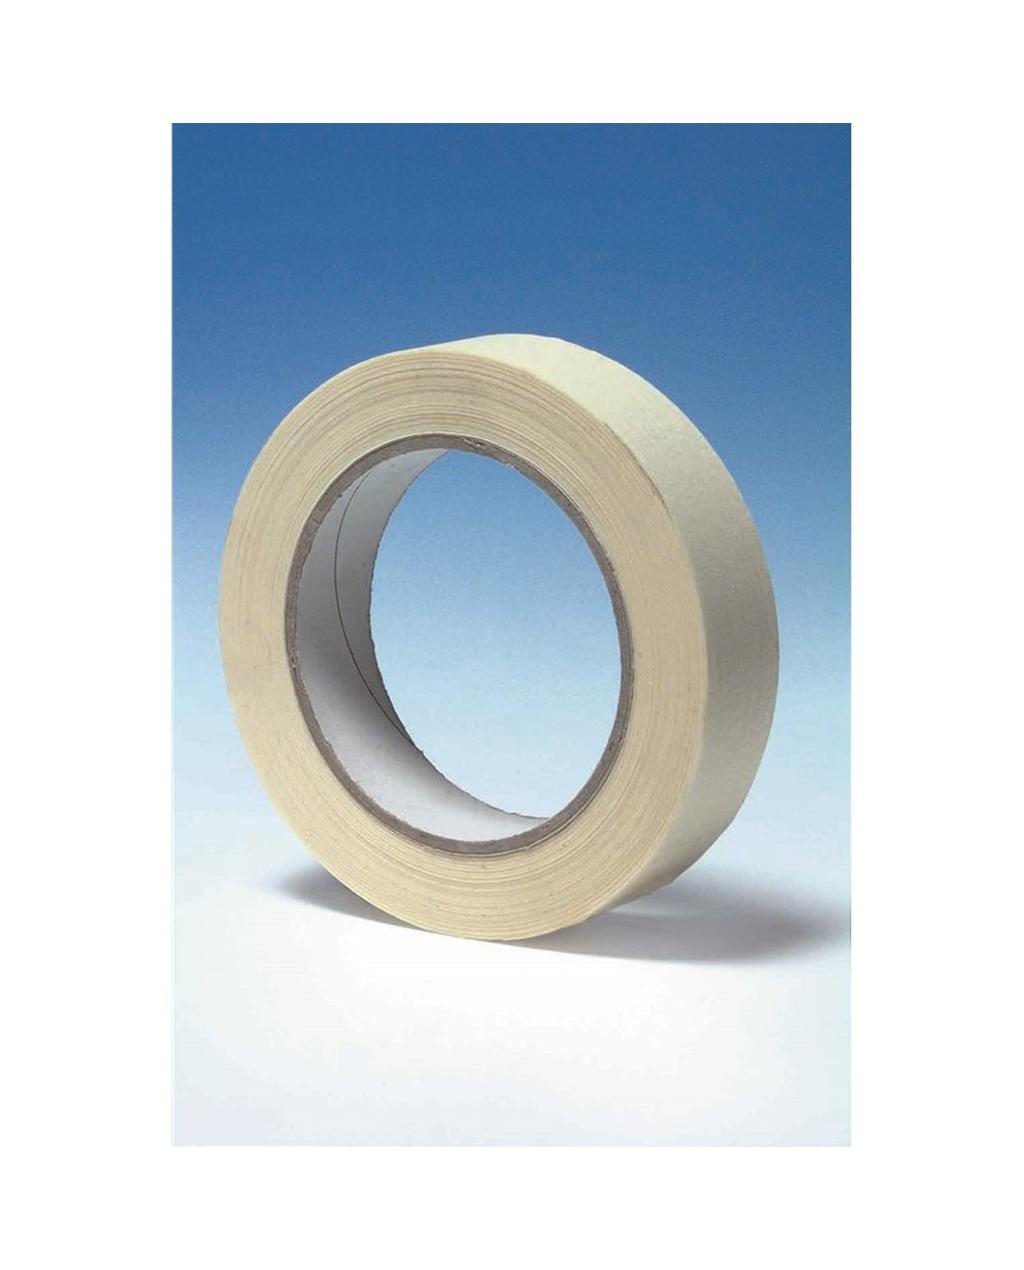 Masking Tape - 25mm x 50m, 76mm Core